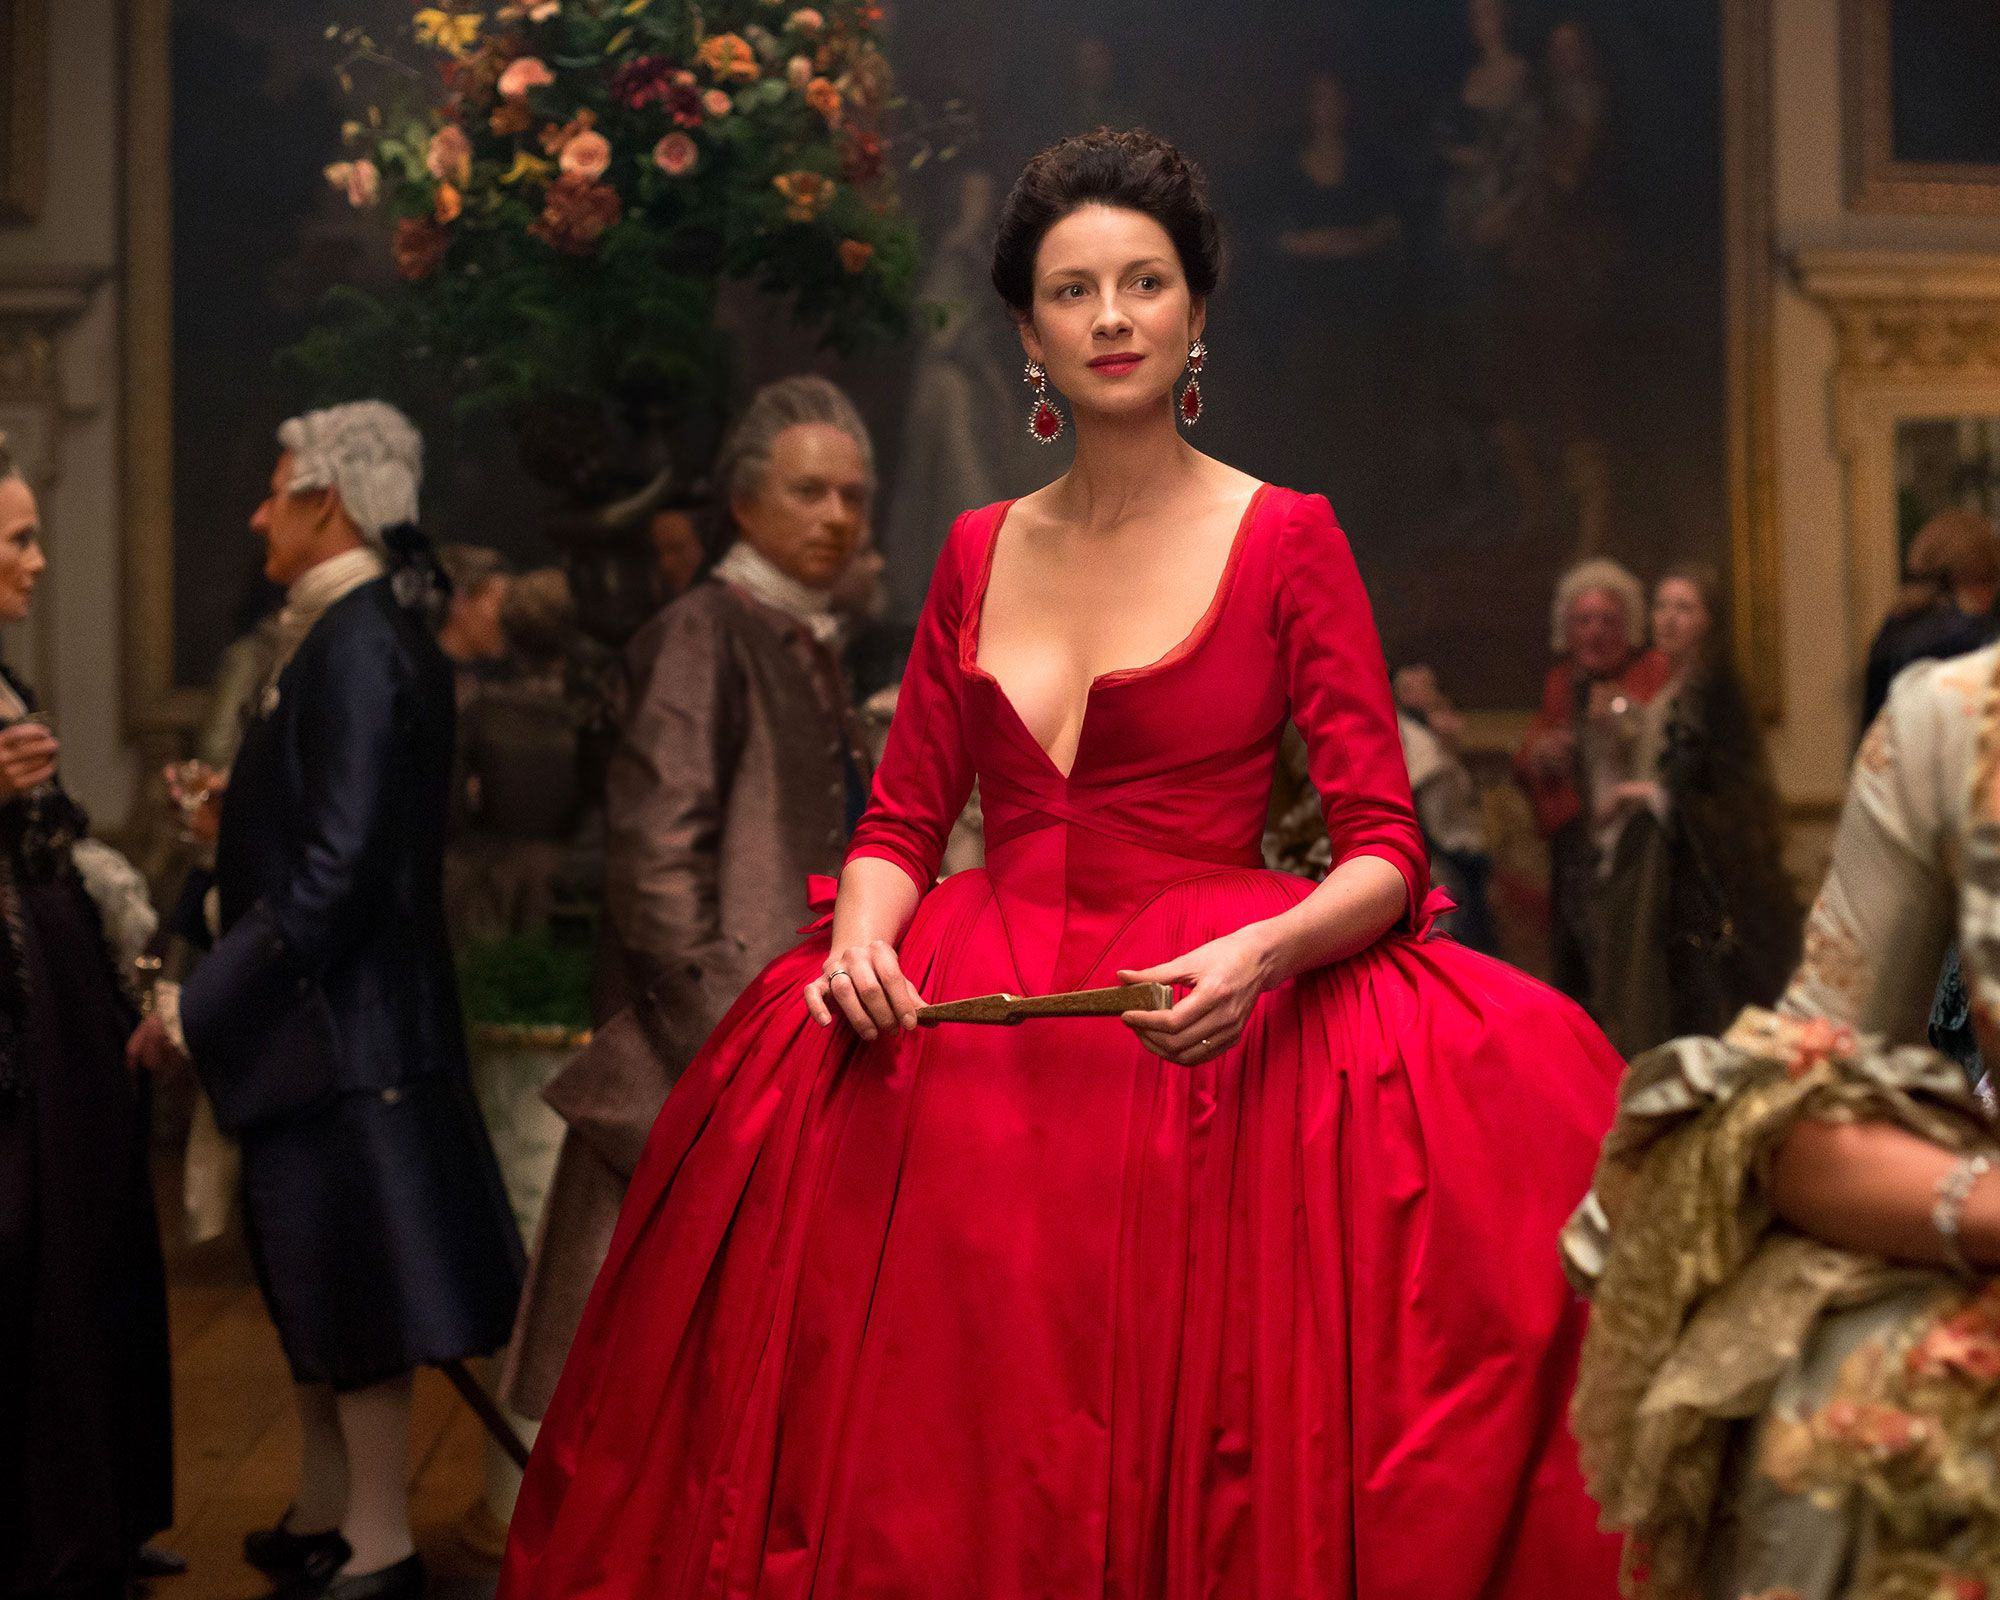 Outlander Season 2 Episode 2 Recap 5 Best Costumes Outlander Costumes Outlander Claire Outlander Season 2